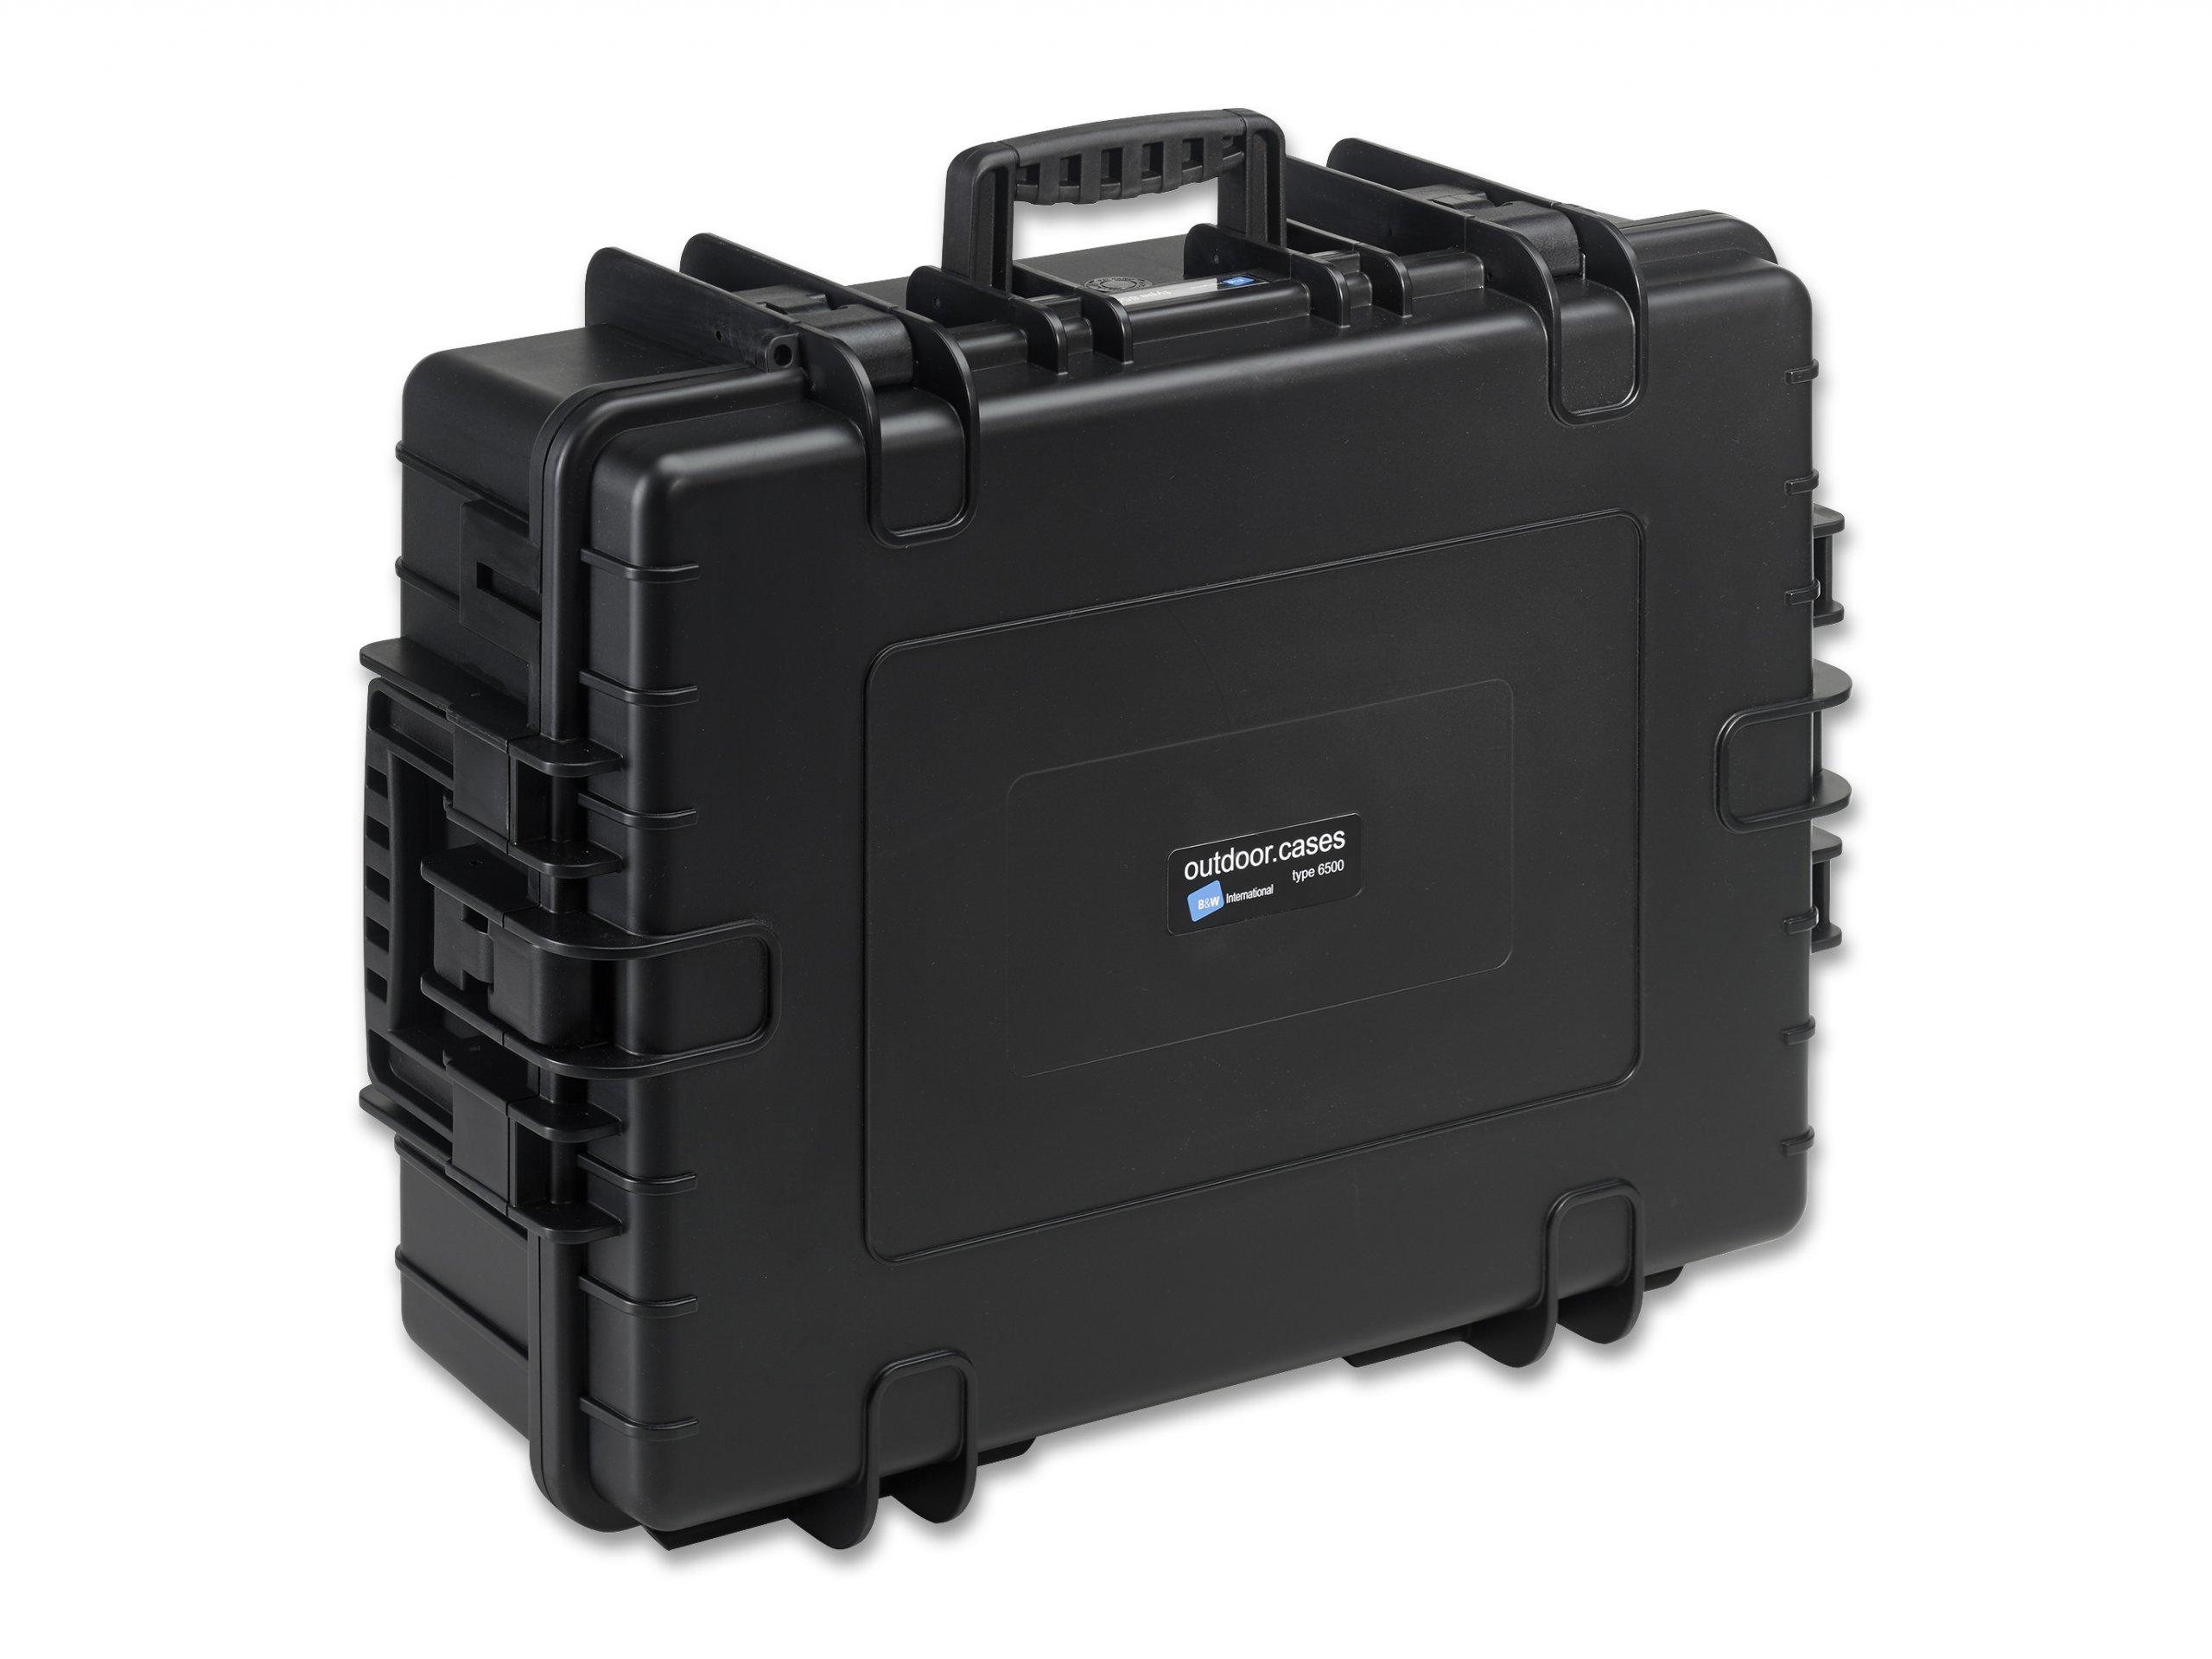 Outdoor Case Typ 6500